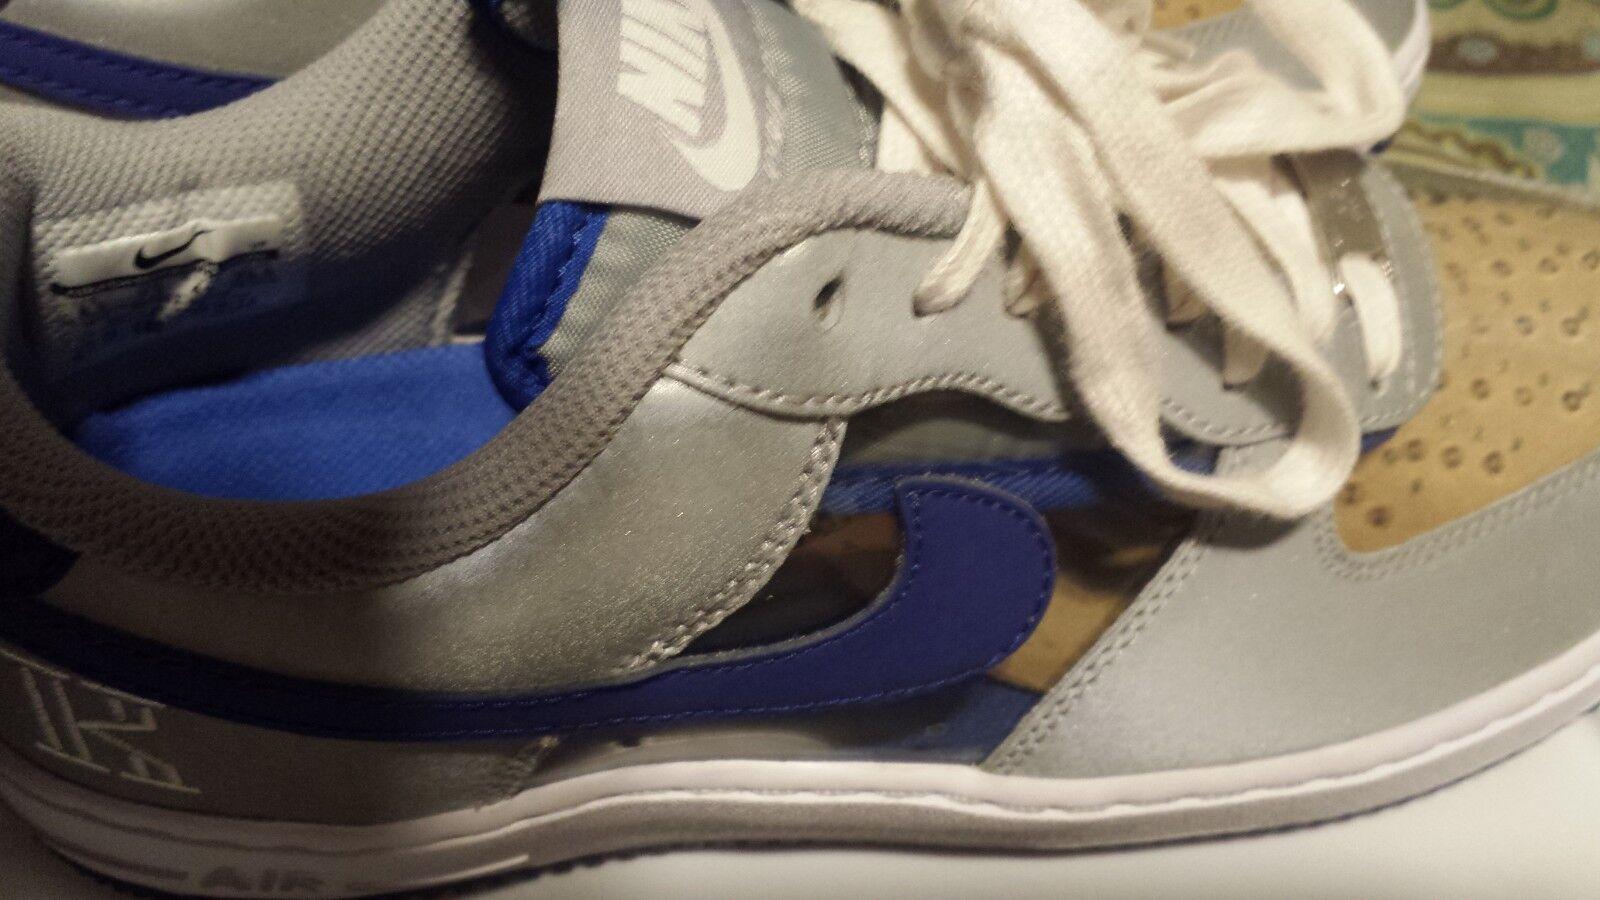 Air force 1 signature kyrie Irving rare bluee 100% original sz 8.5 low tops